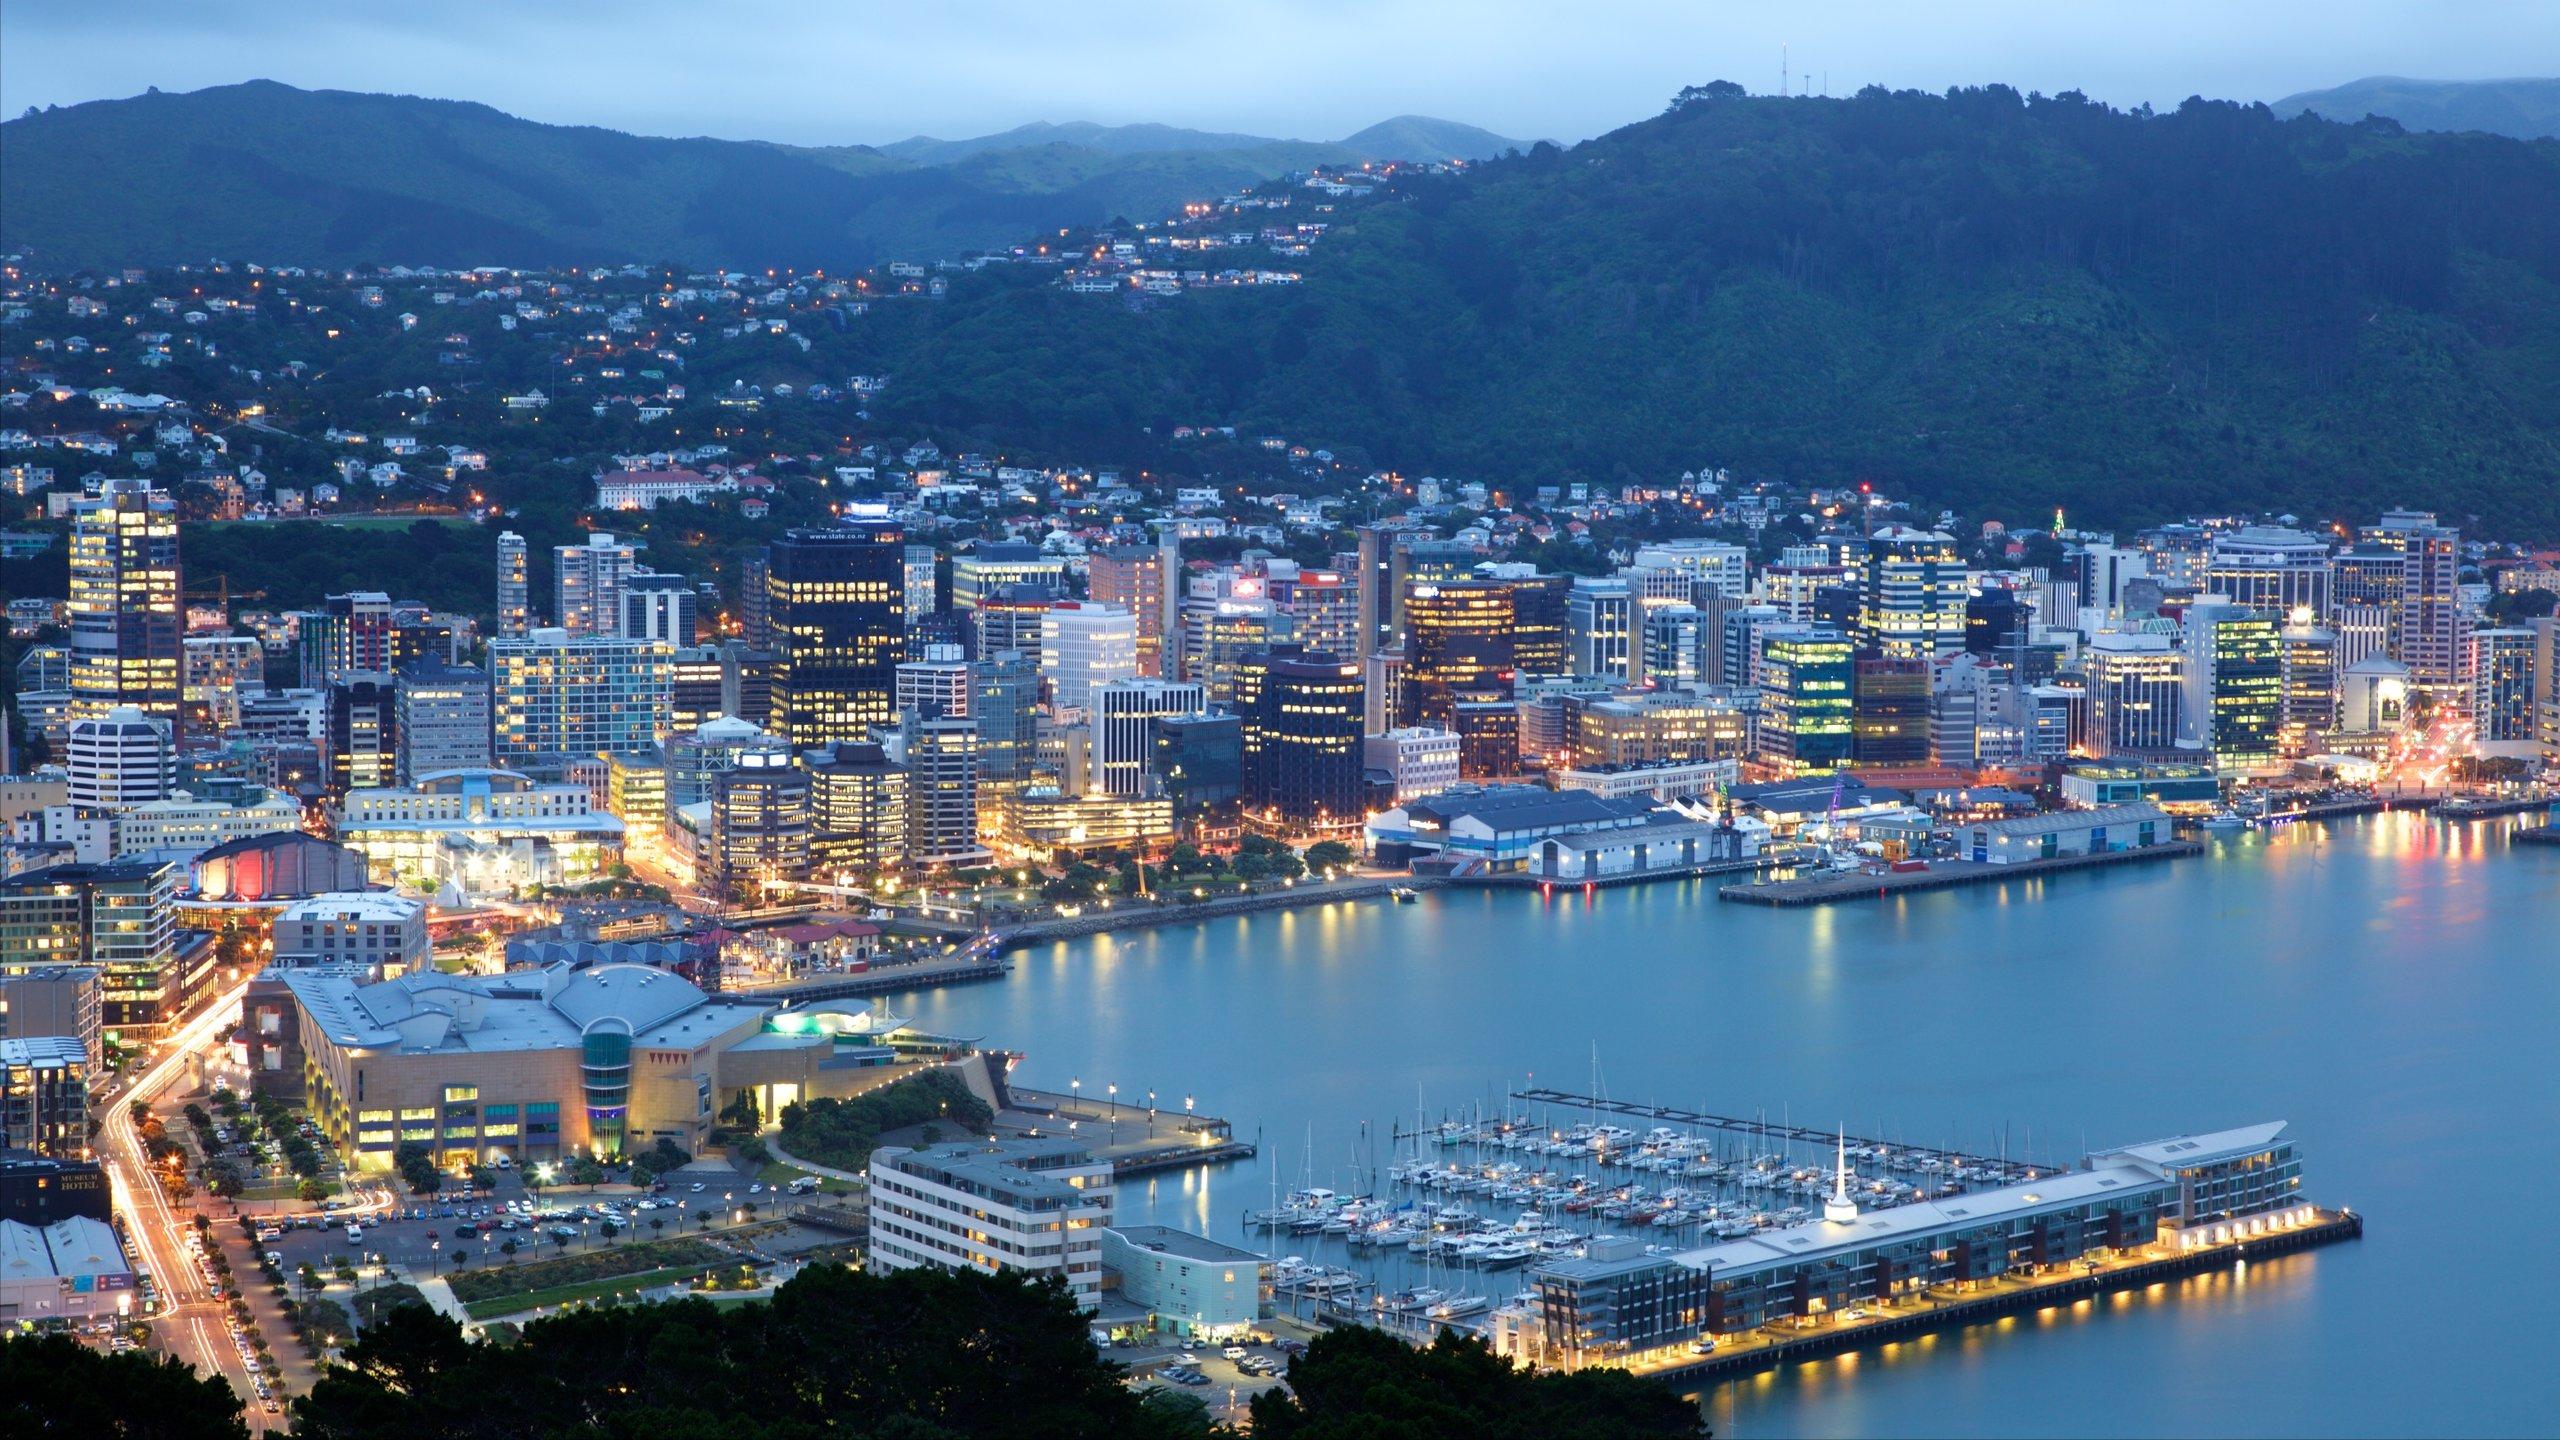 Du lịch Wellington: Tuyệt vời nhất tại Wellington 2021  Expedia.com.vn